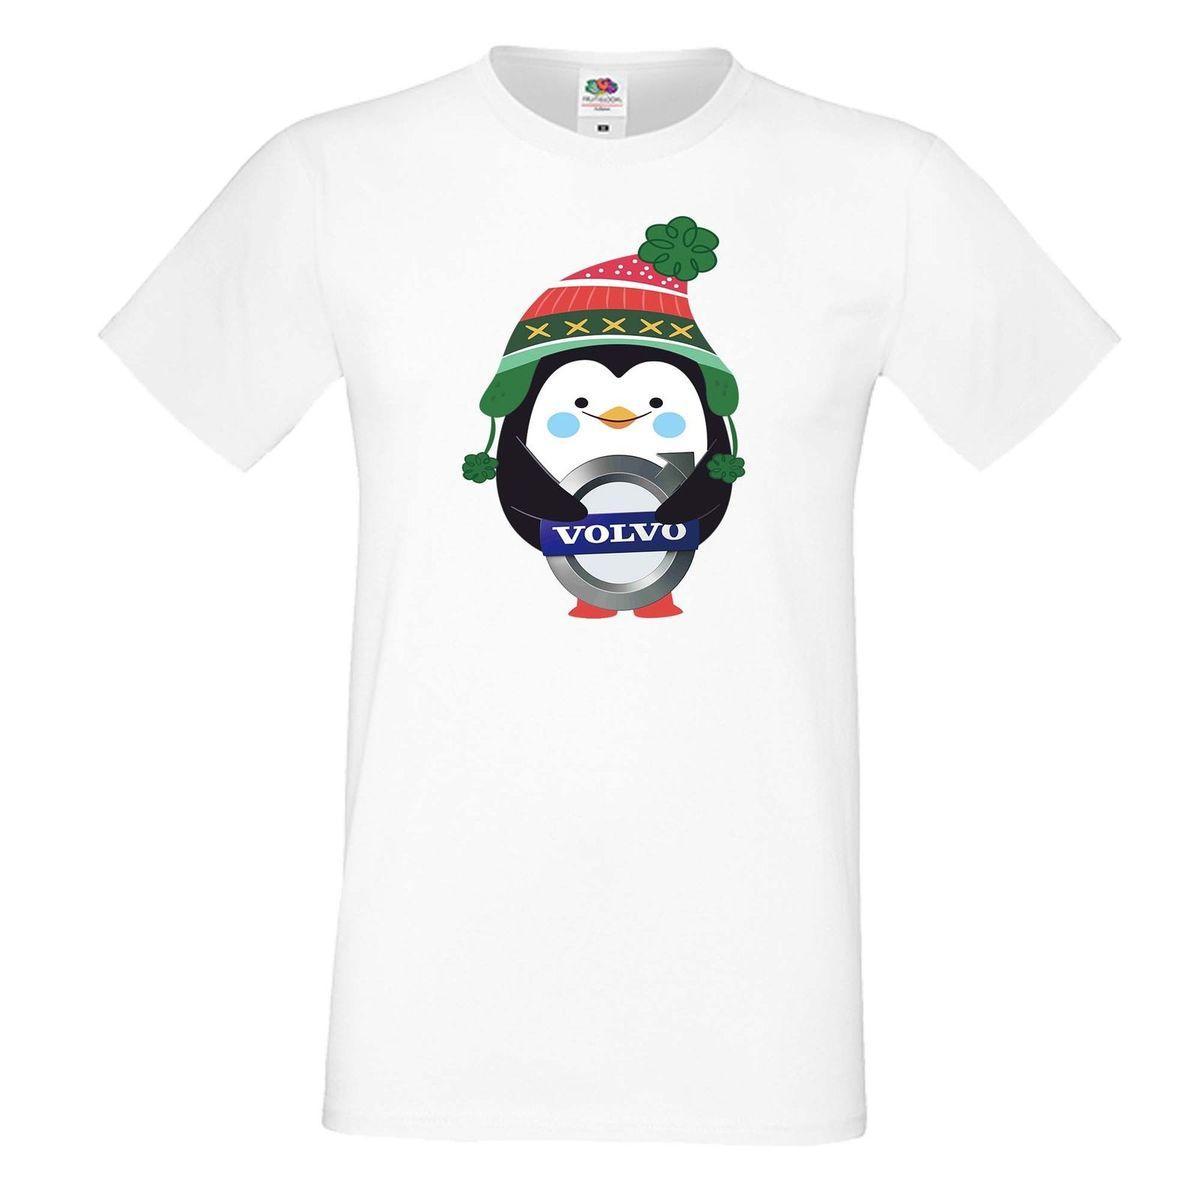 T Shirt Weihnachten.Herren Men T Shirt Tee Volvo Penguin Winter Gift Geschenk Weihnachten